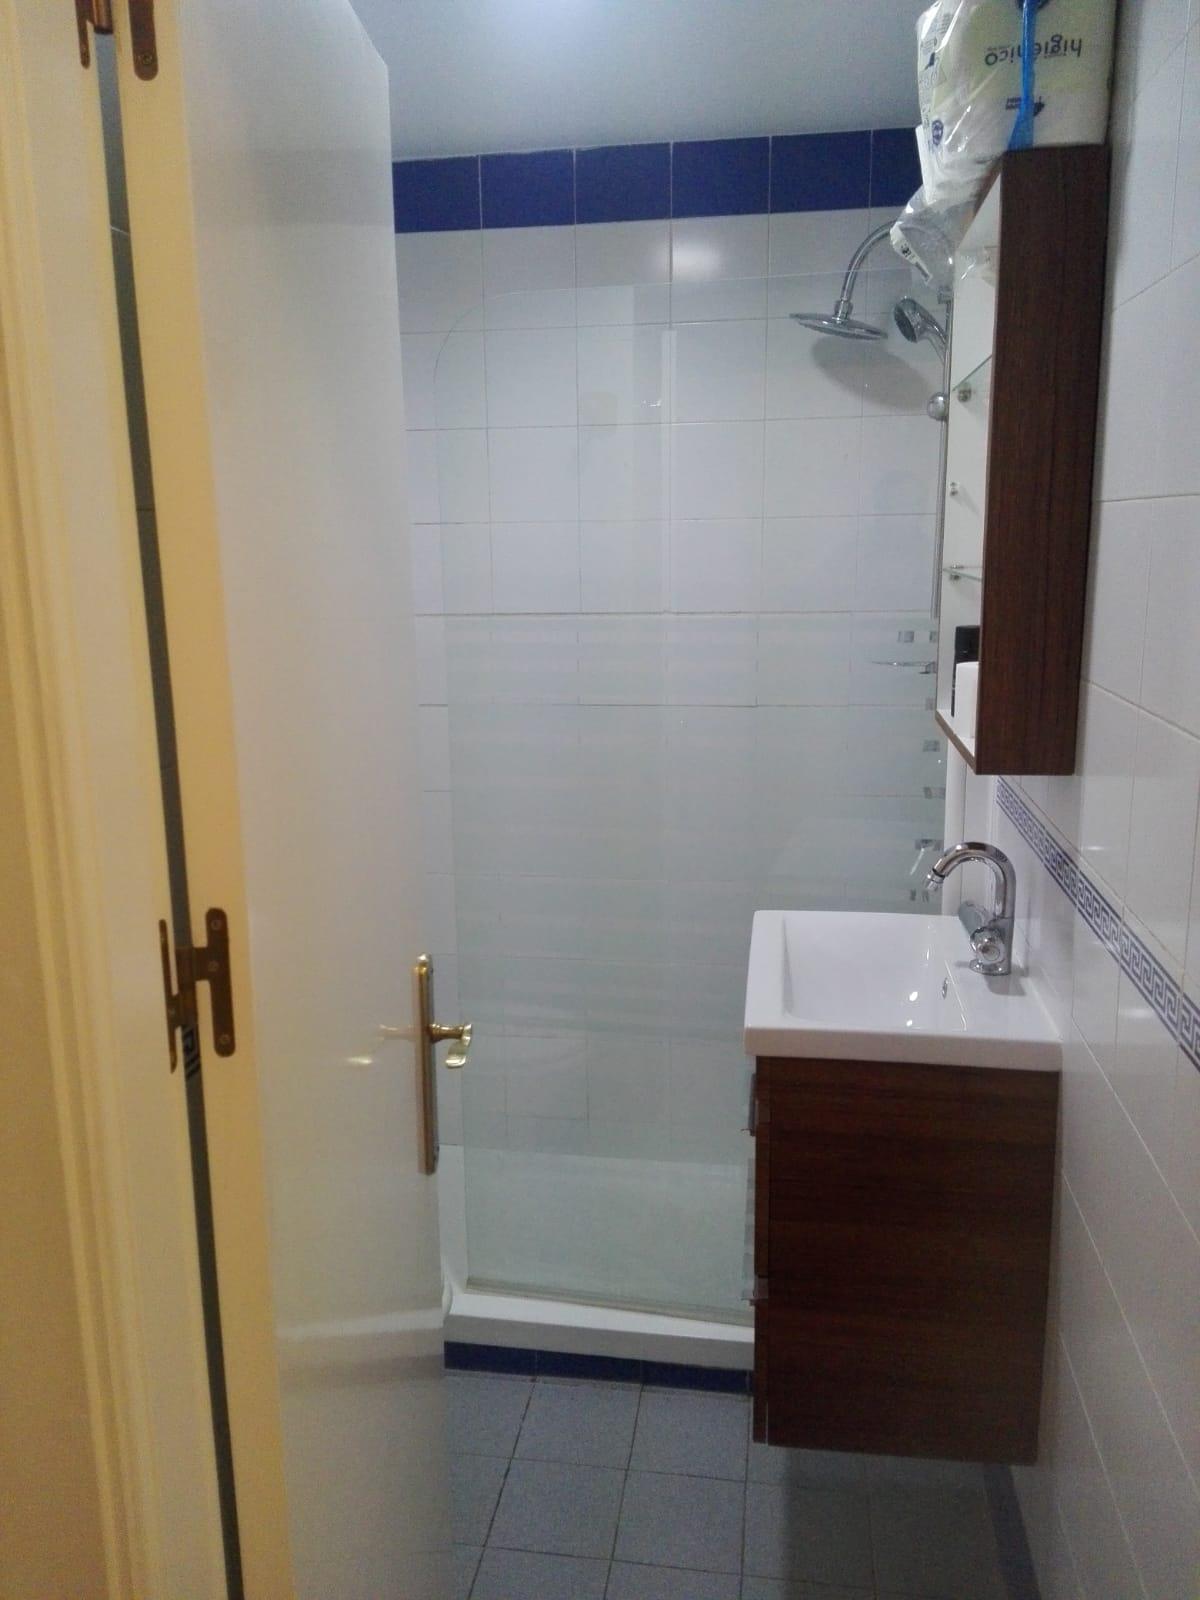 Flat for rent in Almanjáyar (Granada), 450 €/month (Season)